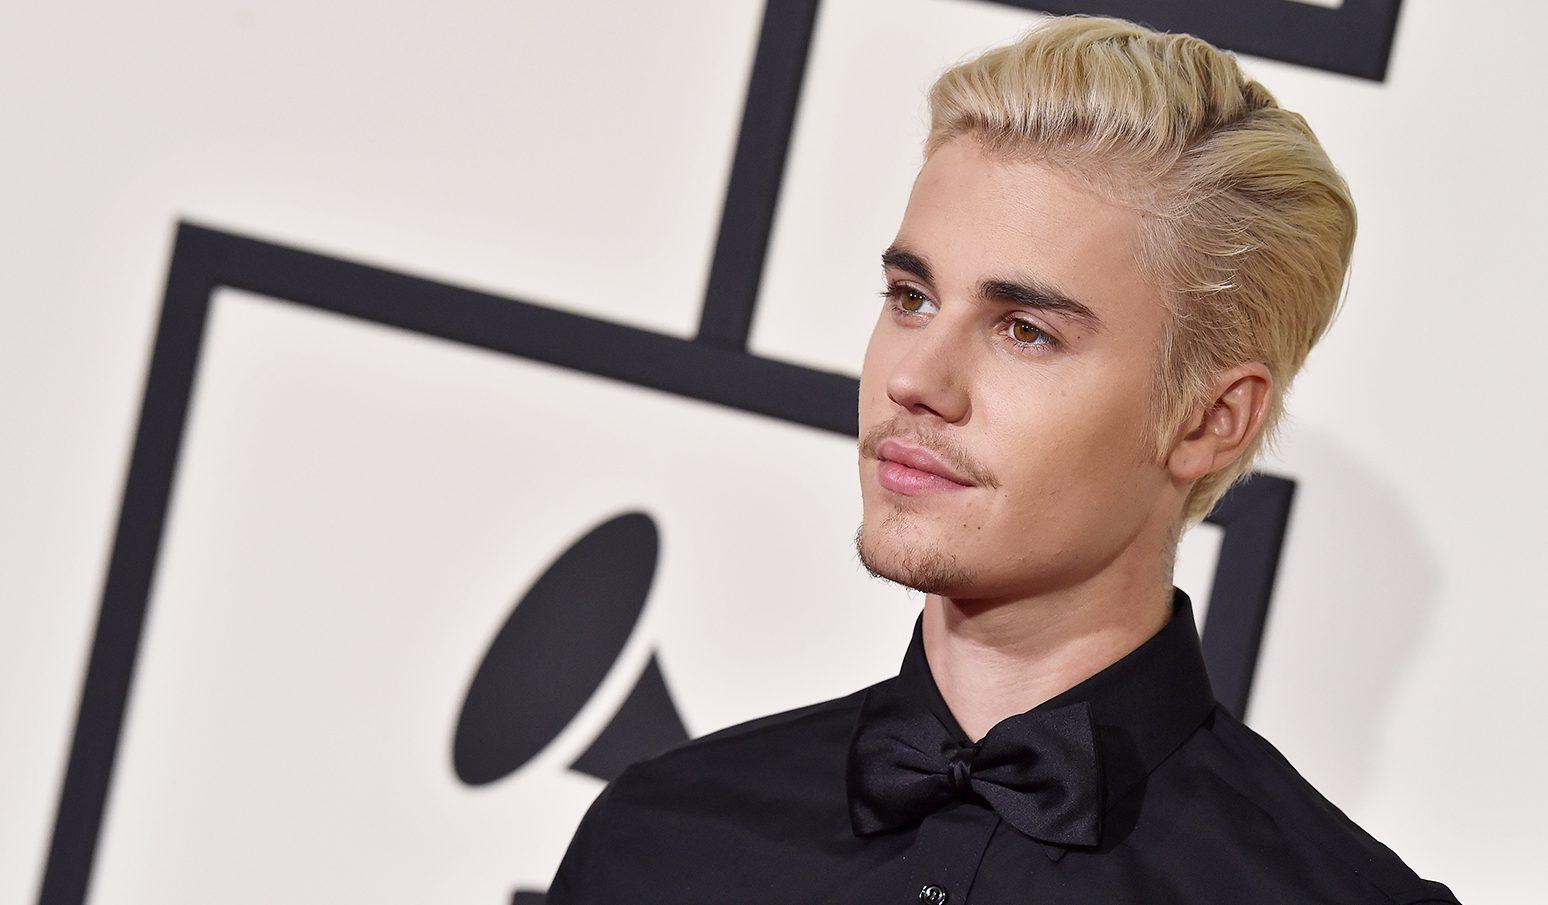 Justin Bieber Gay Barda Öpüşürken Görüldü